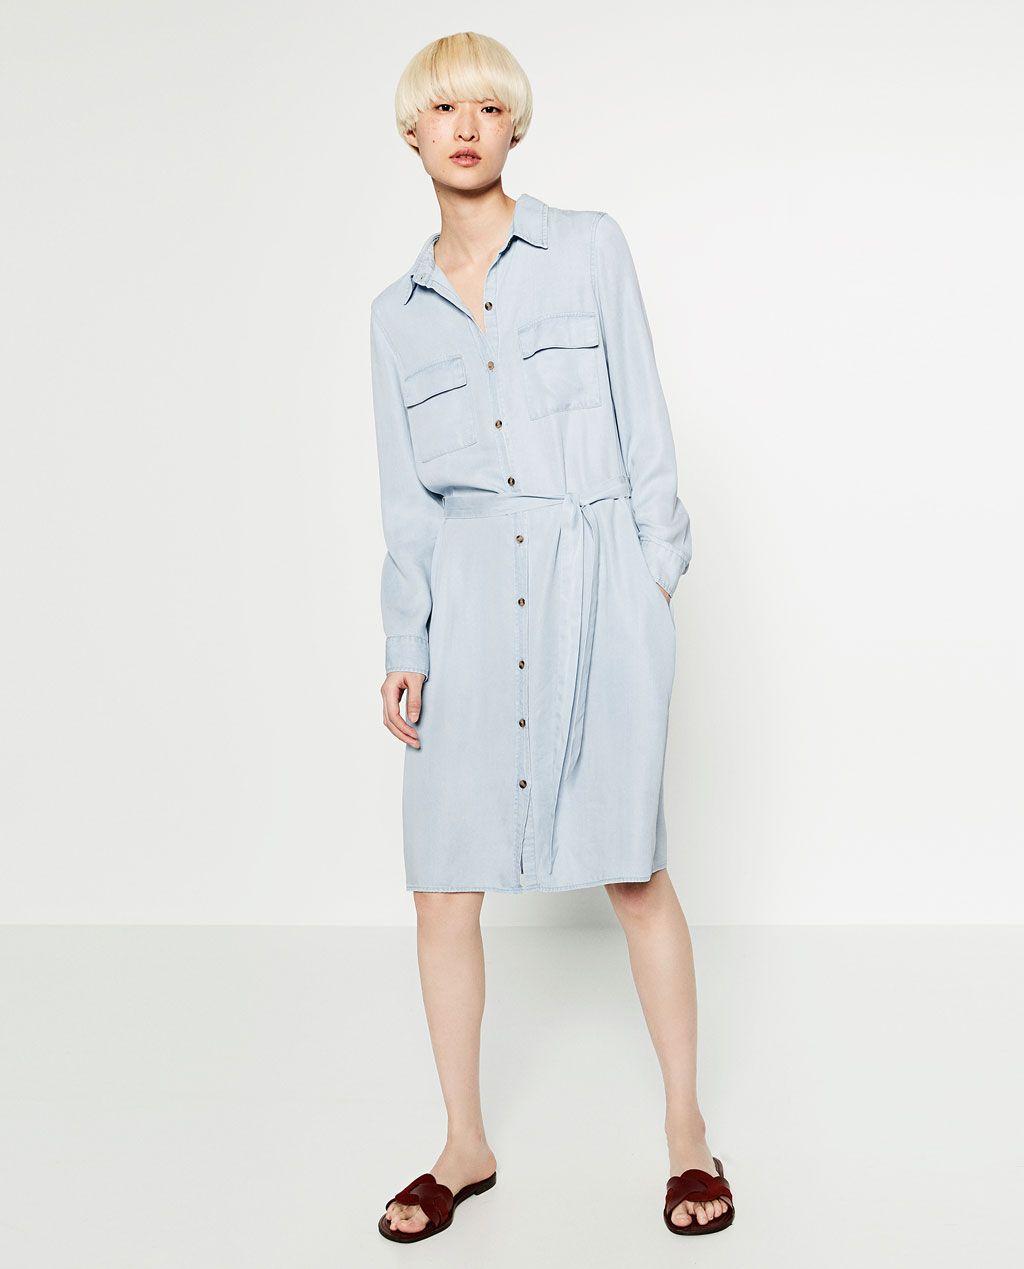 6f36b2549 Image 1 of DENIM SHIRT DRESS from Zara | my wardrobe | Denim shirt ...